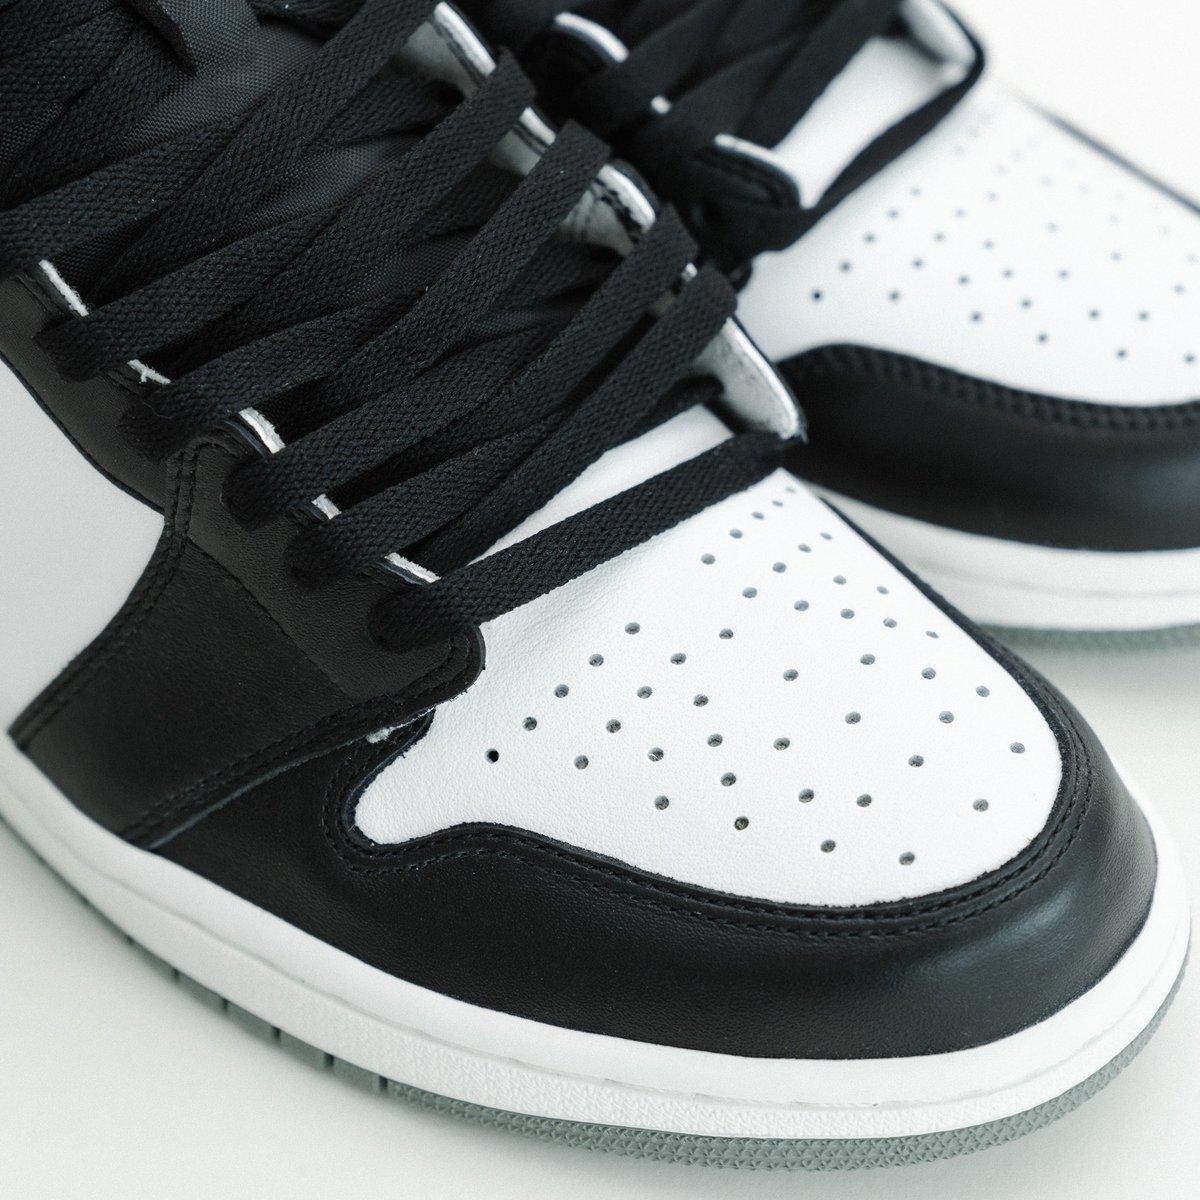 "online retailer 2ff7b 25cdb Men s Nike Air Jordan 1 Retro High OG ""Clay Green"" Available Now at SF  South Miami   Cutler Bay    160pic.twitter.com CUmgGIjlAl"